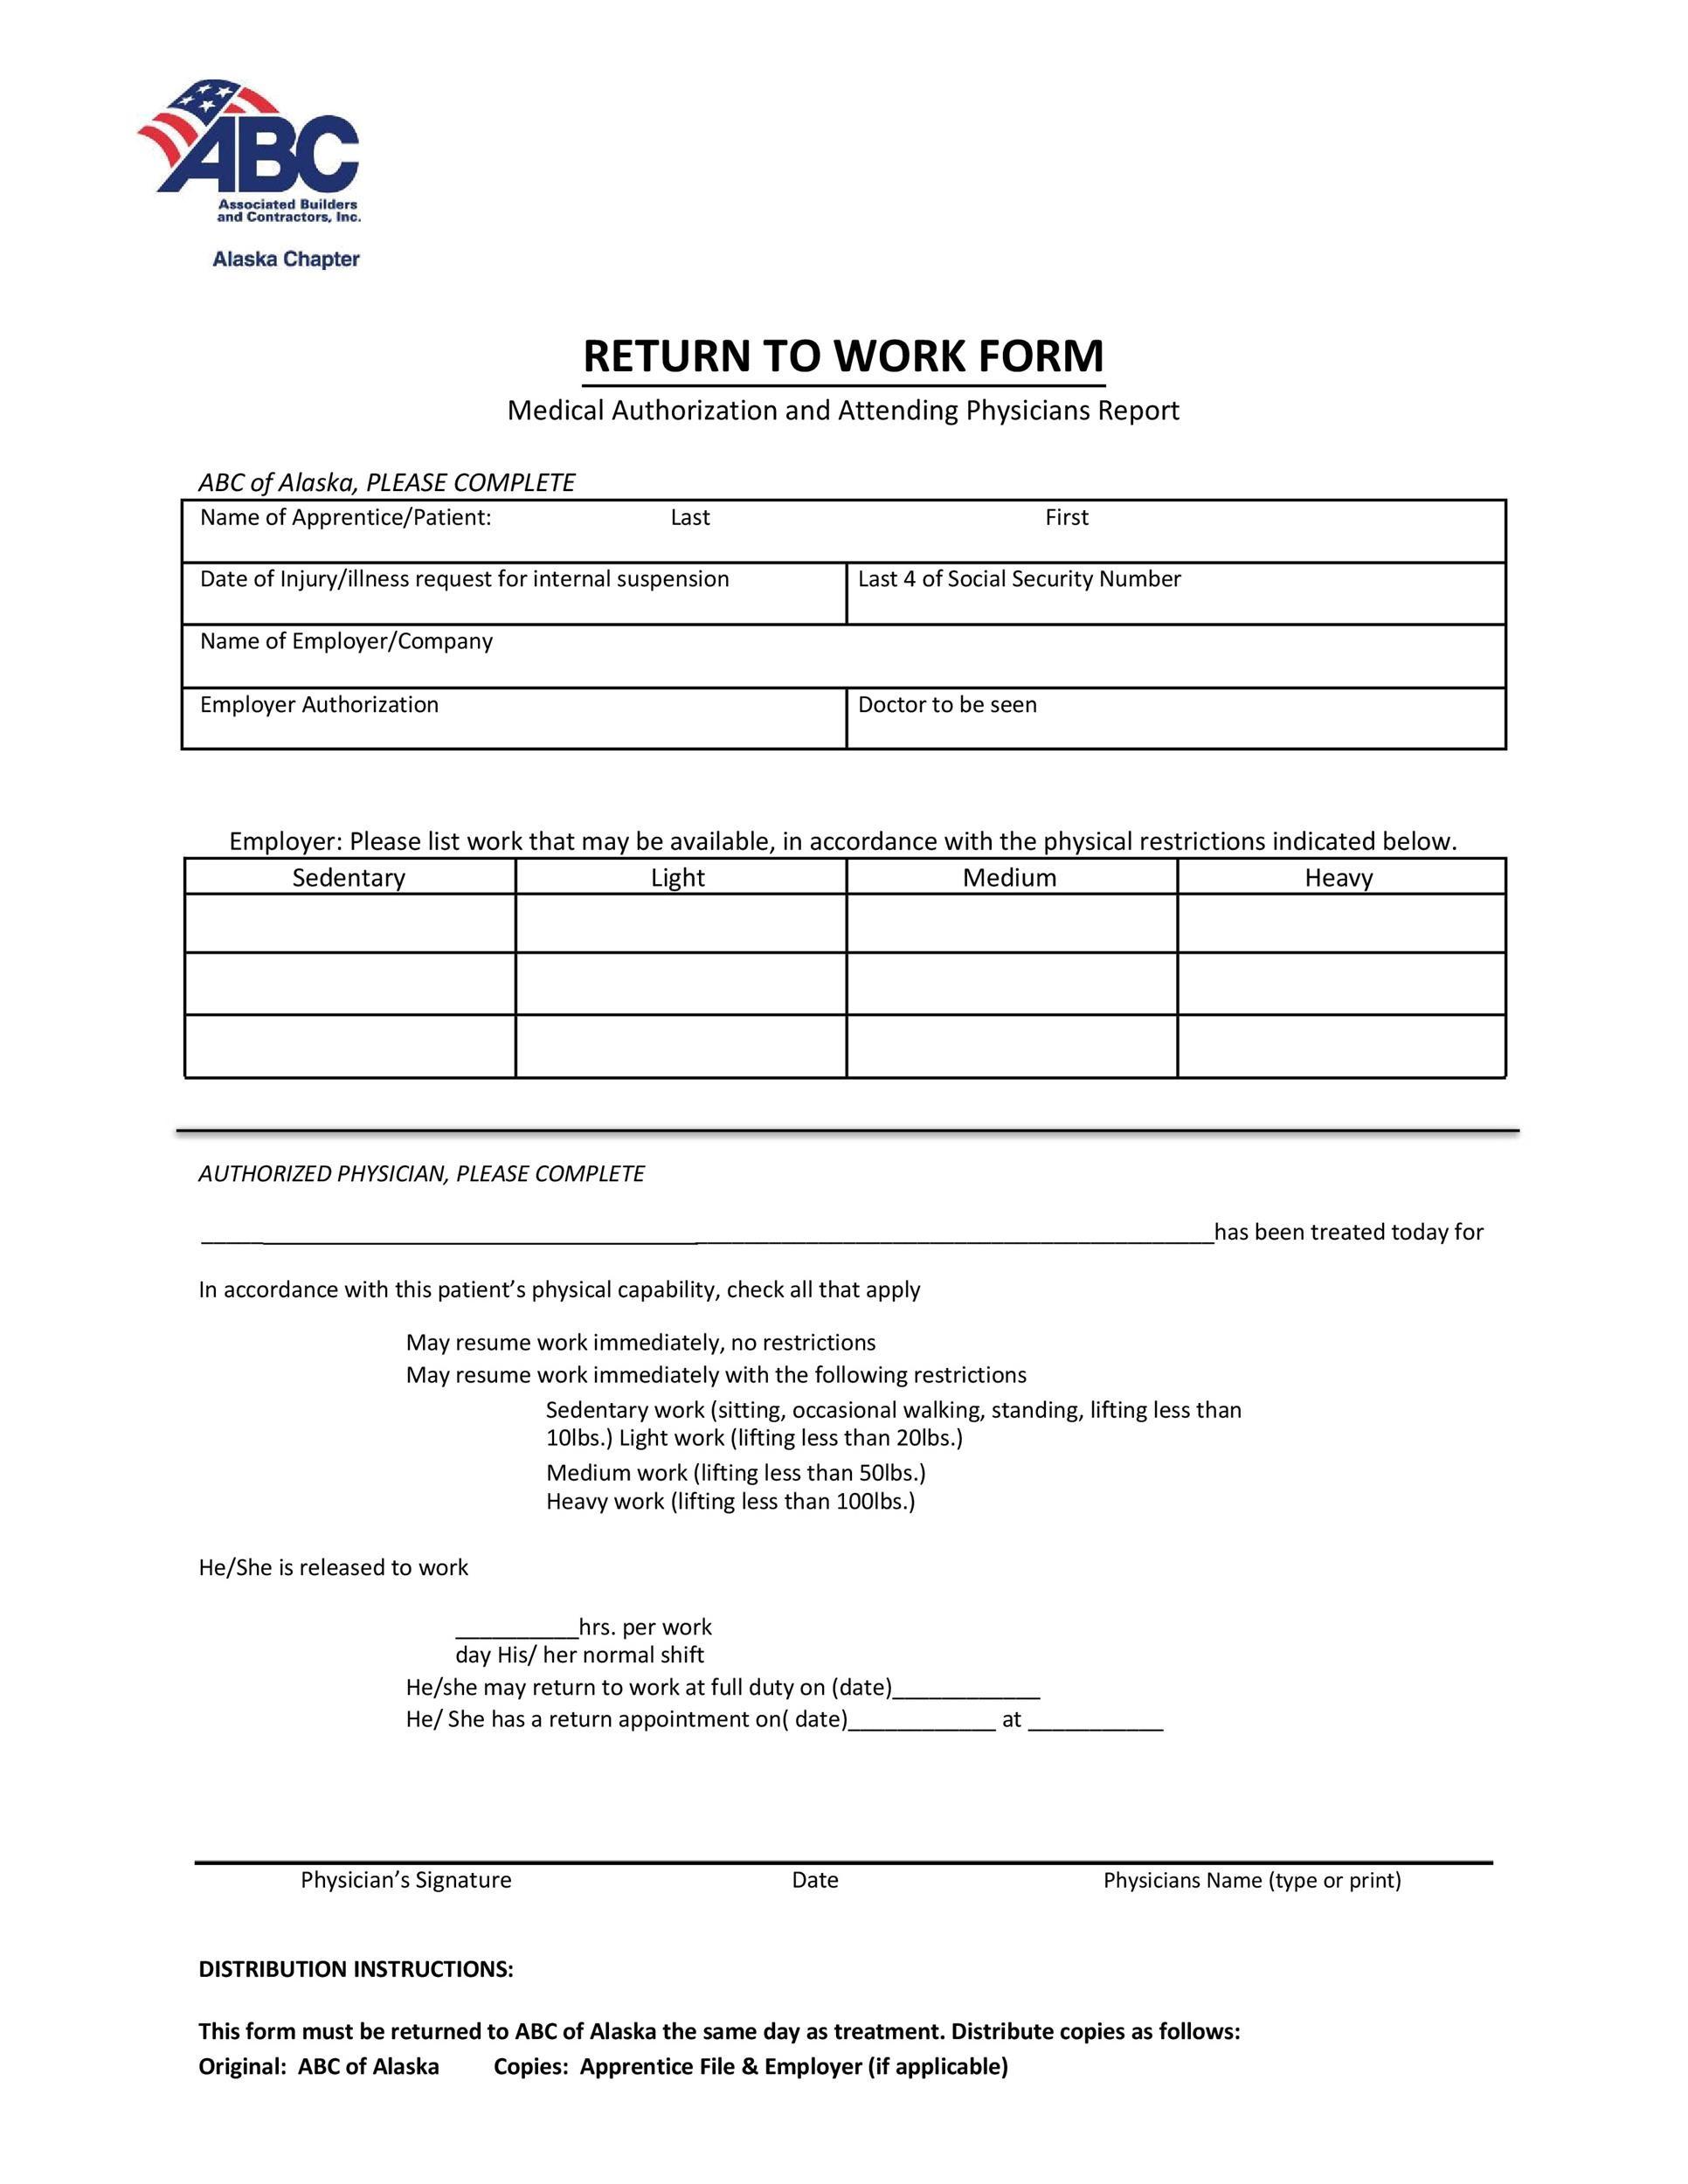 Free return to work form 25